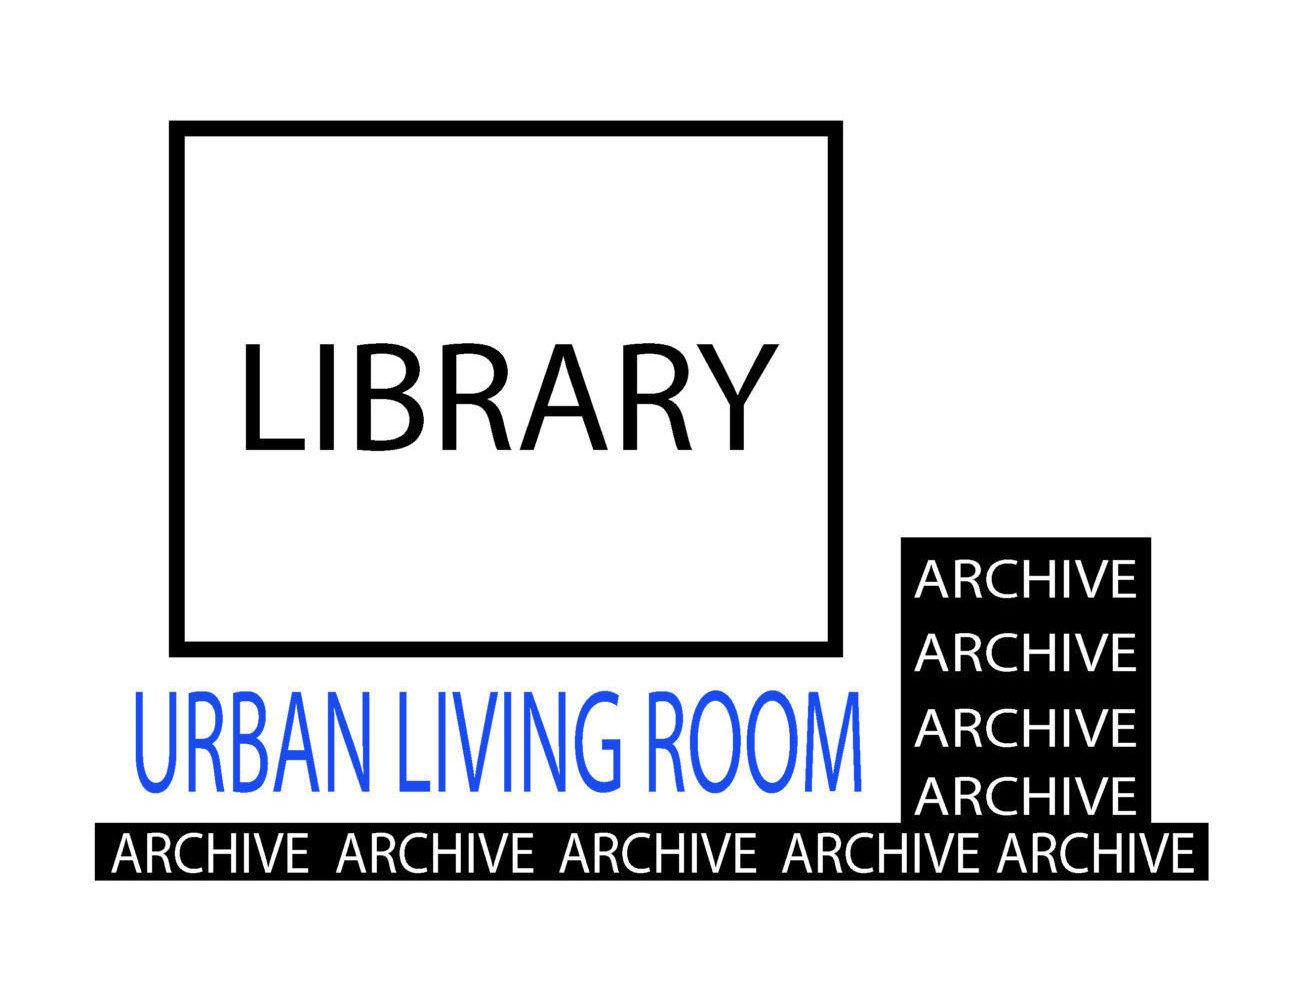 spatial practice architecture office Los Angeles Hong Kong varna public library varna bulgaria urban living room concept diagram